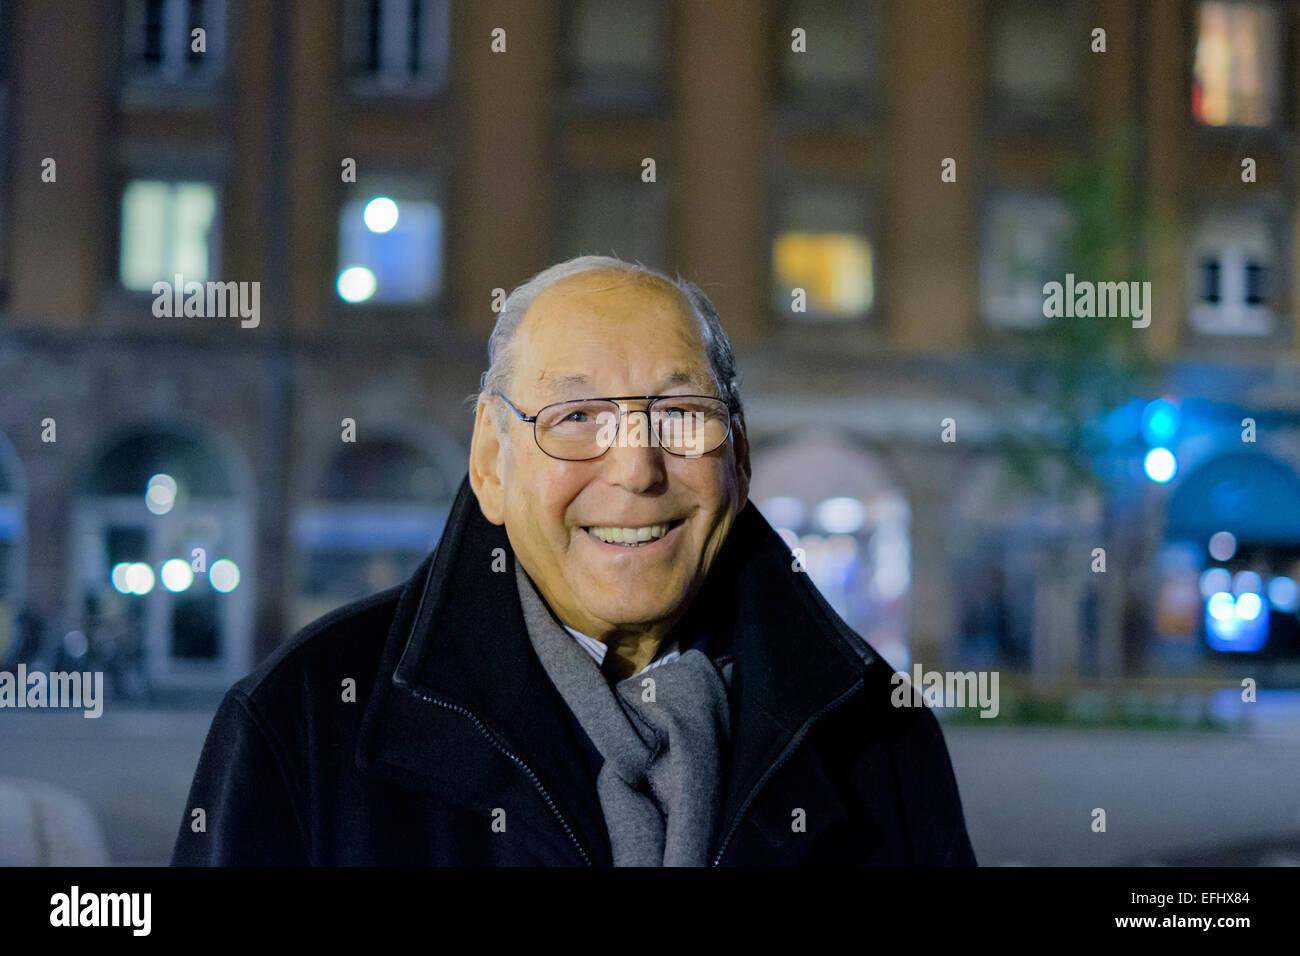 Lächelnde älterer Mann 80er Jahre Porträt bei Nacht Stockbild